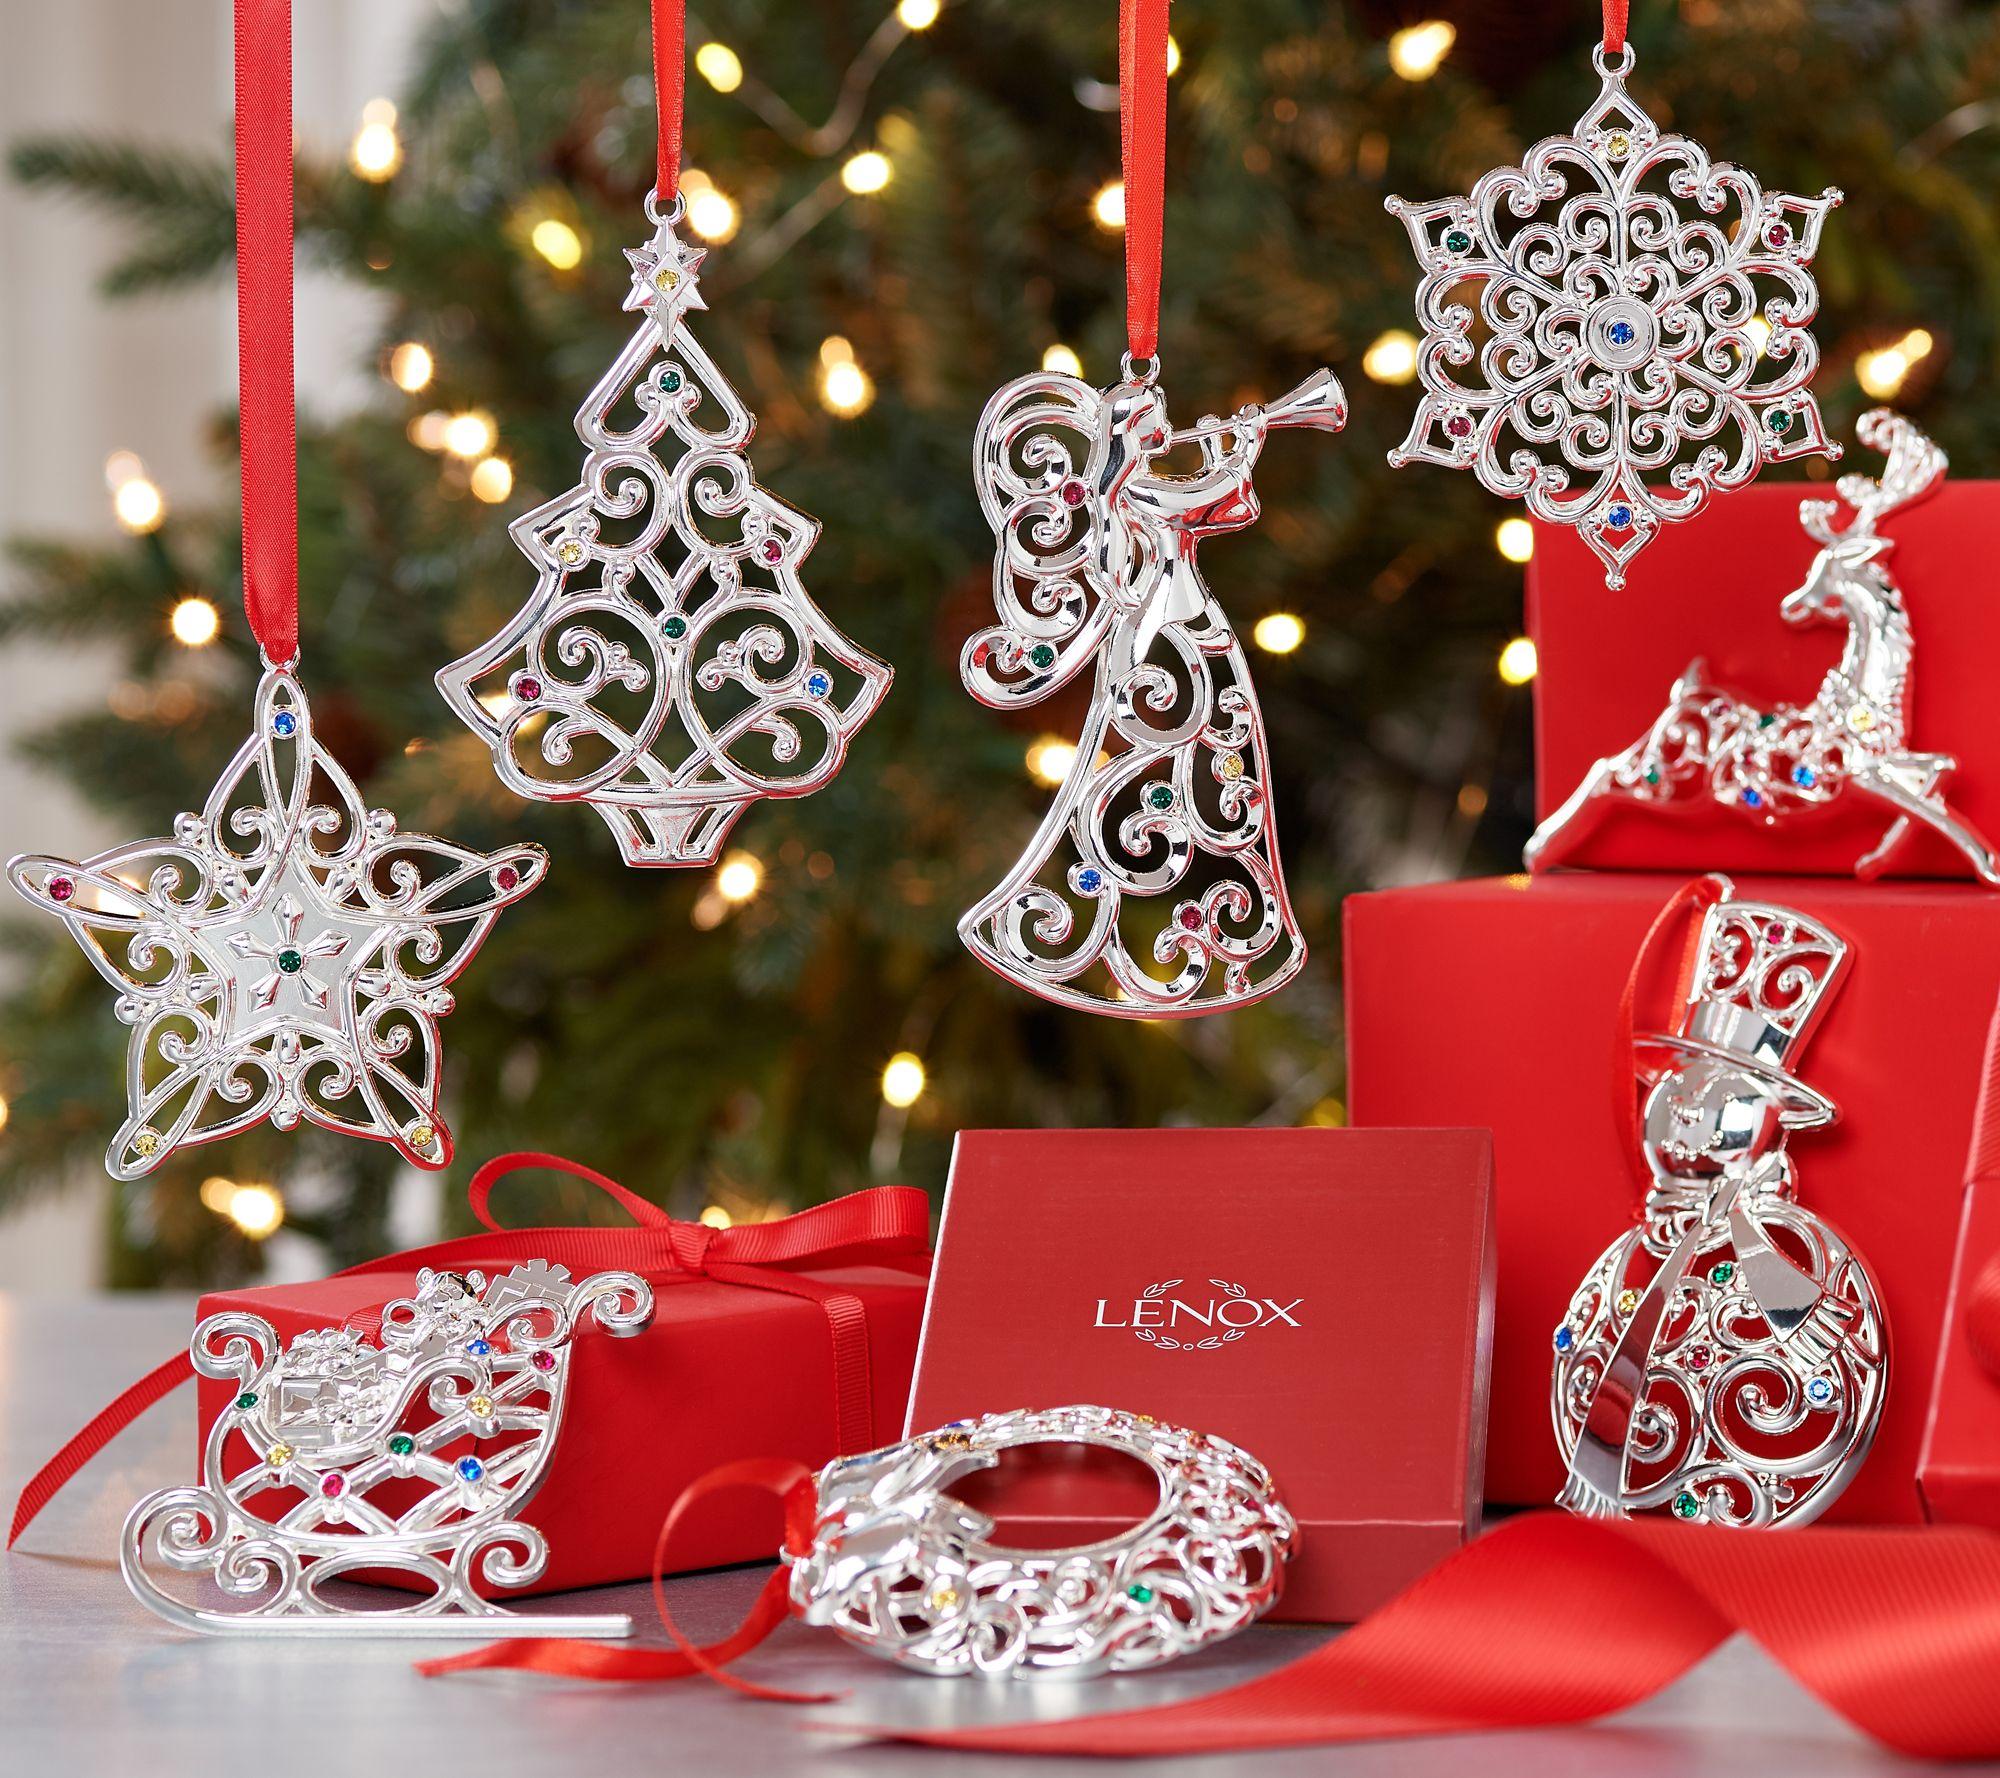 8 Vintage Glass Small Motorbike Christmas Tree Ornaments